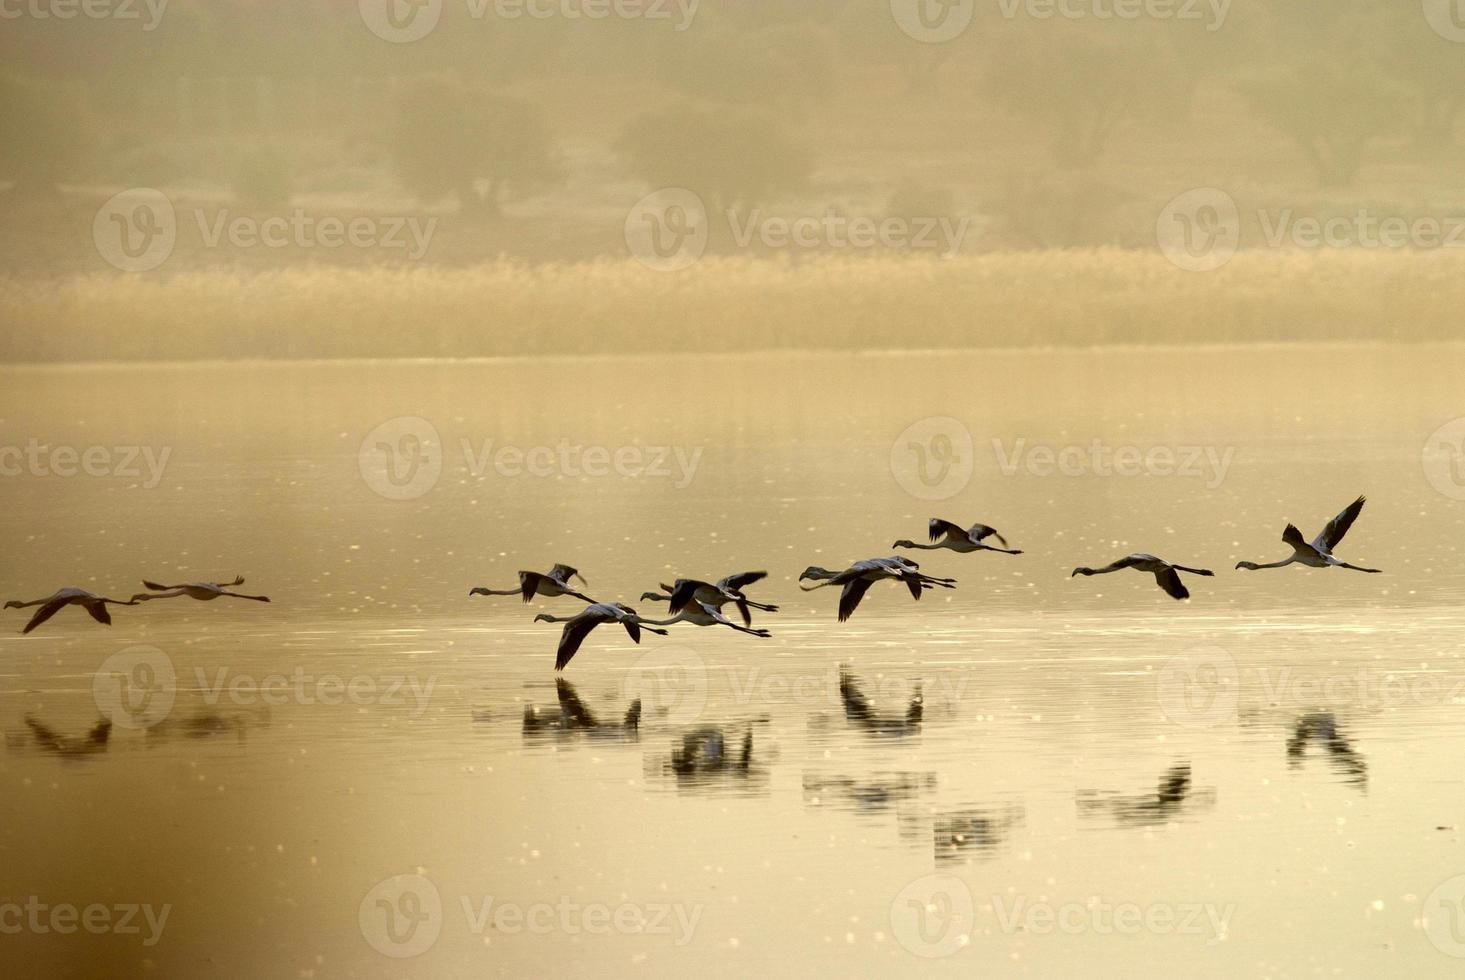 flamingo's (phoenicopterus) in laguna de calderon, moreel de calatrava. foto